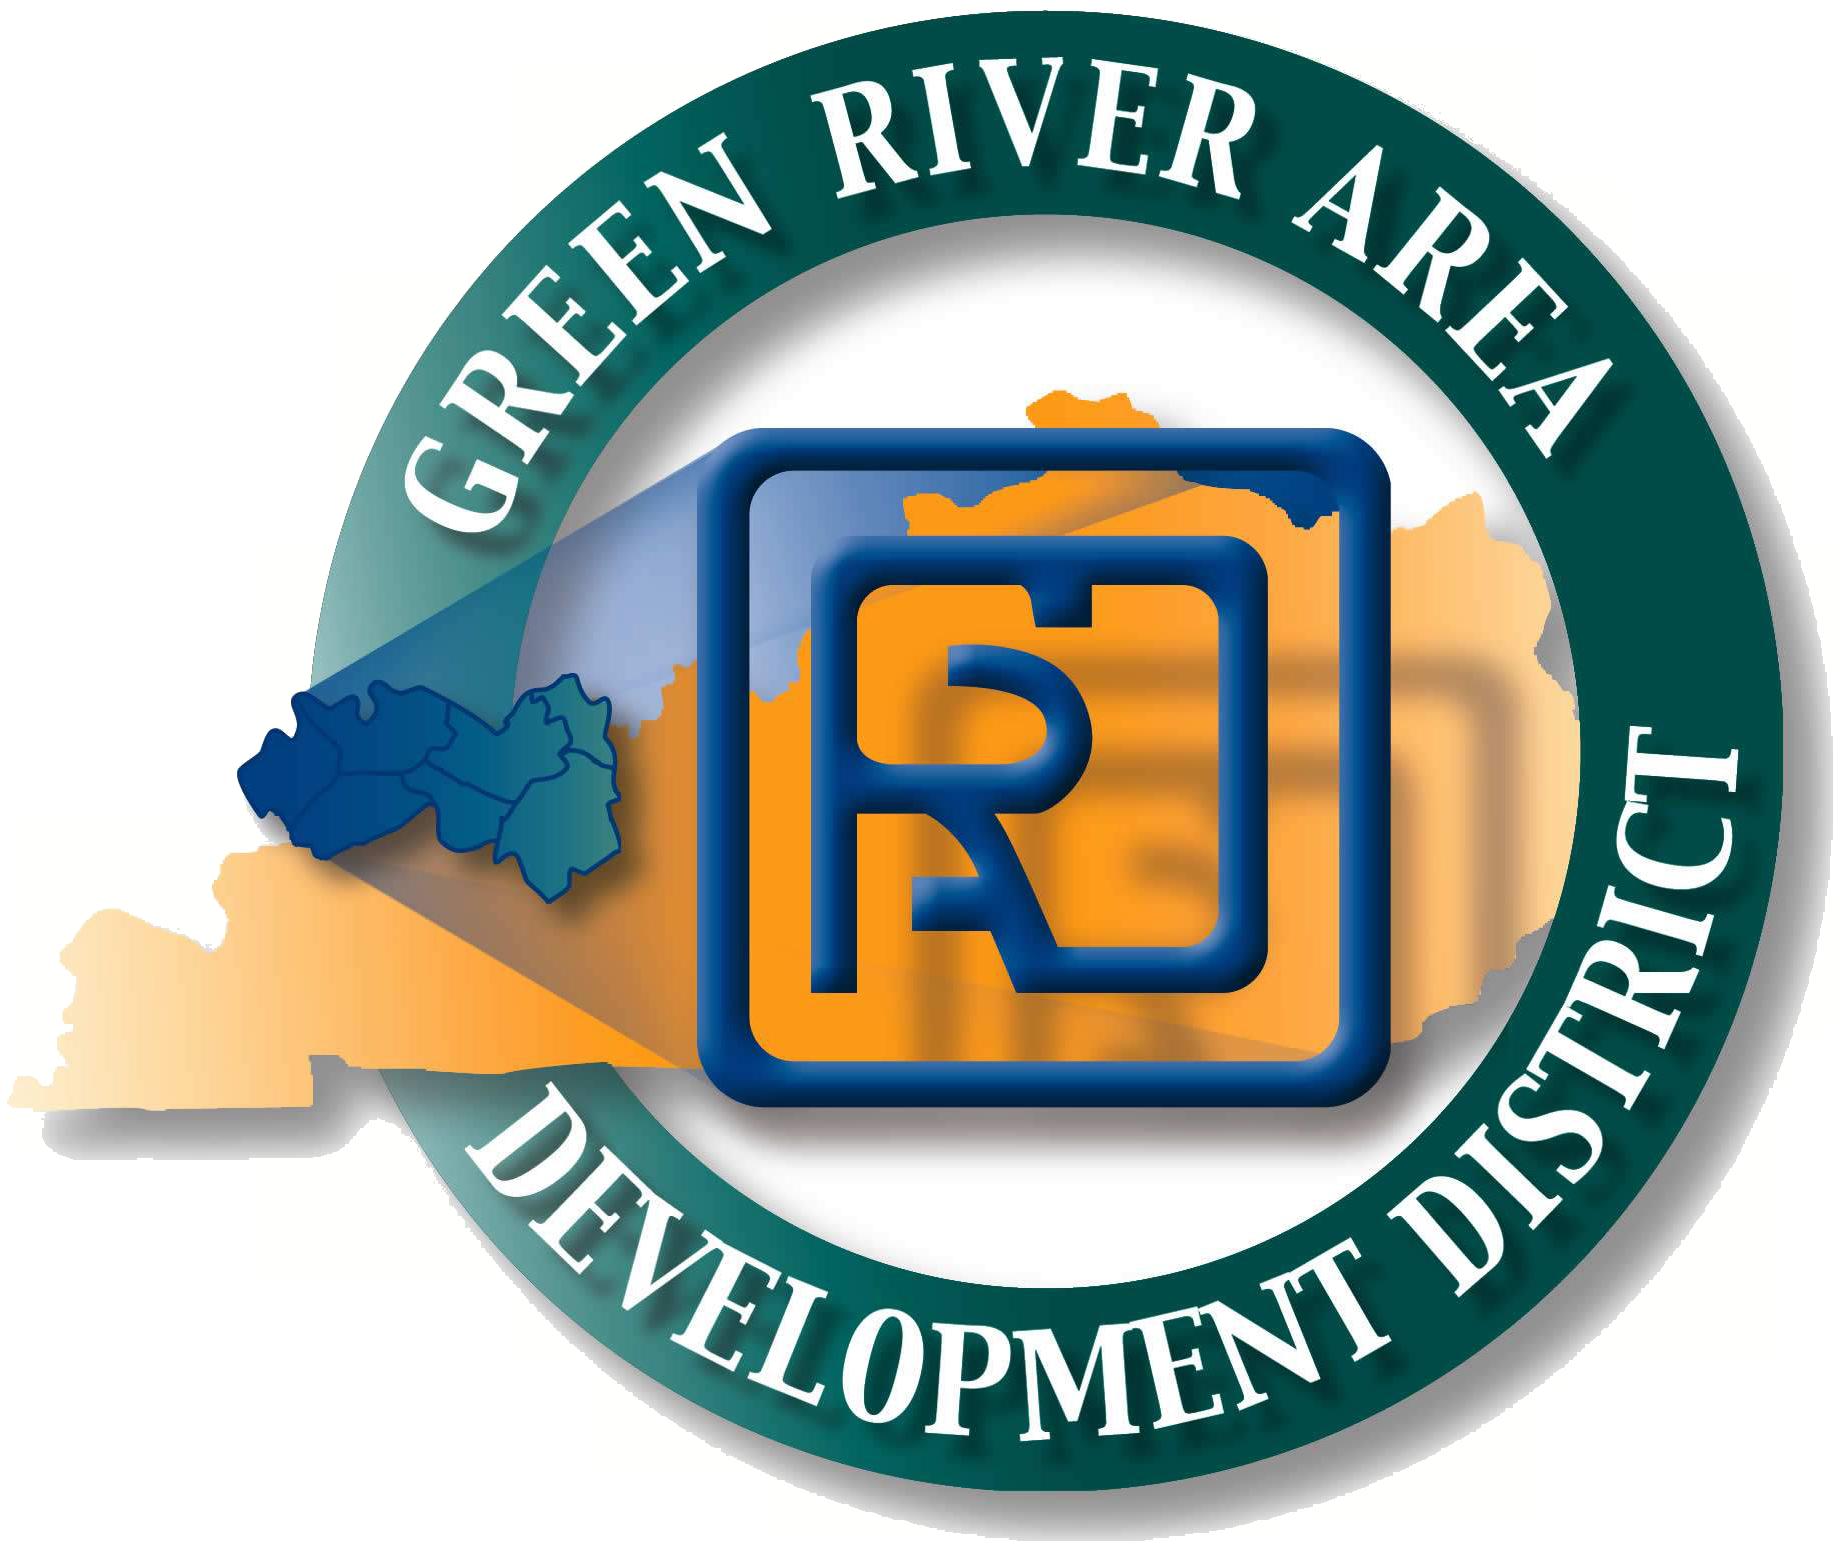 GRADD Seeks Input on Economic Development Plan